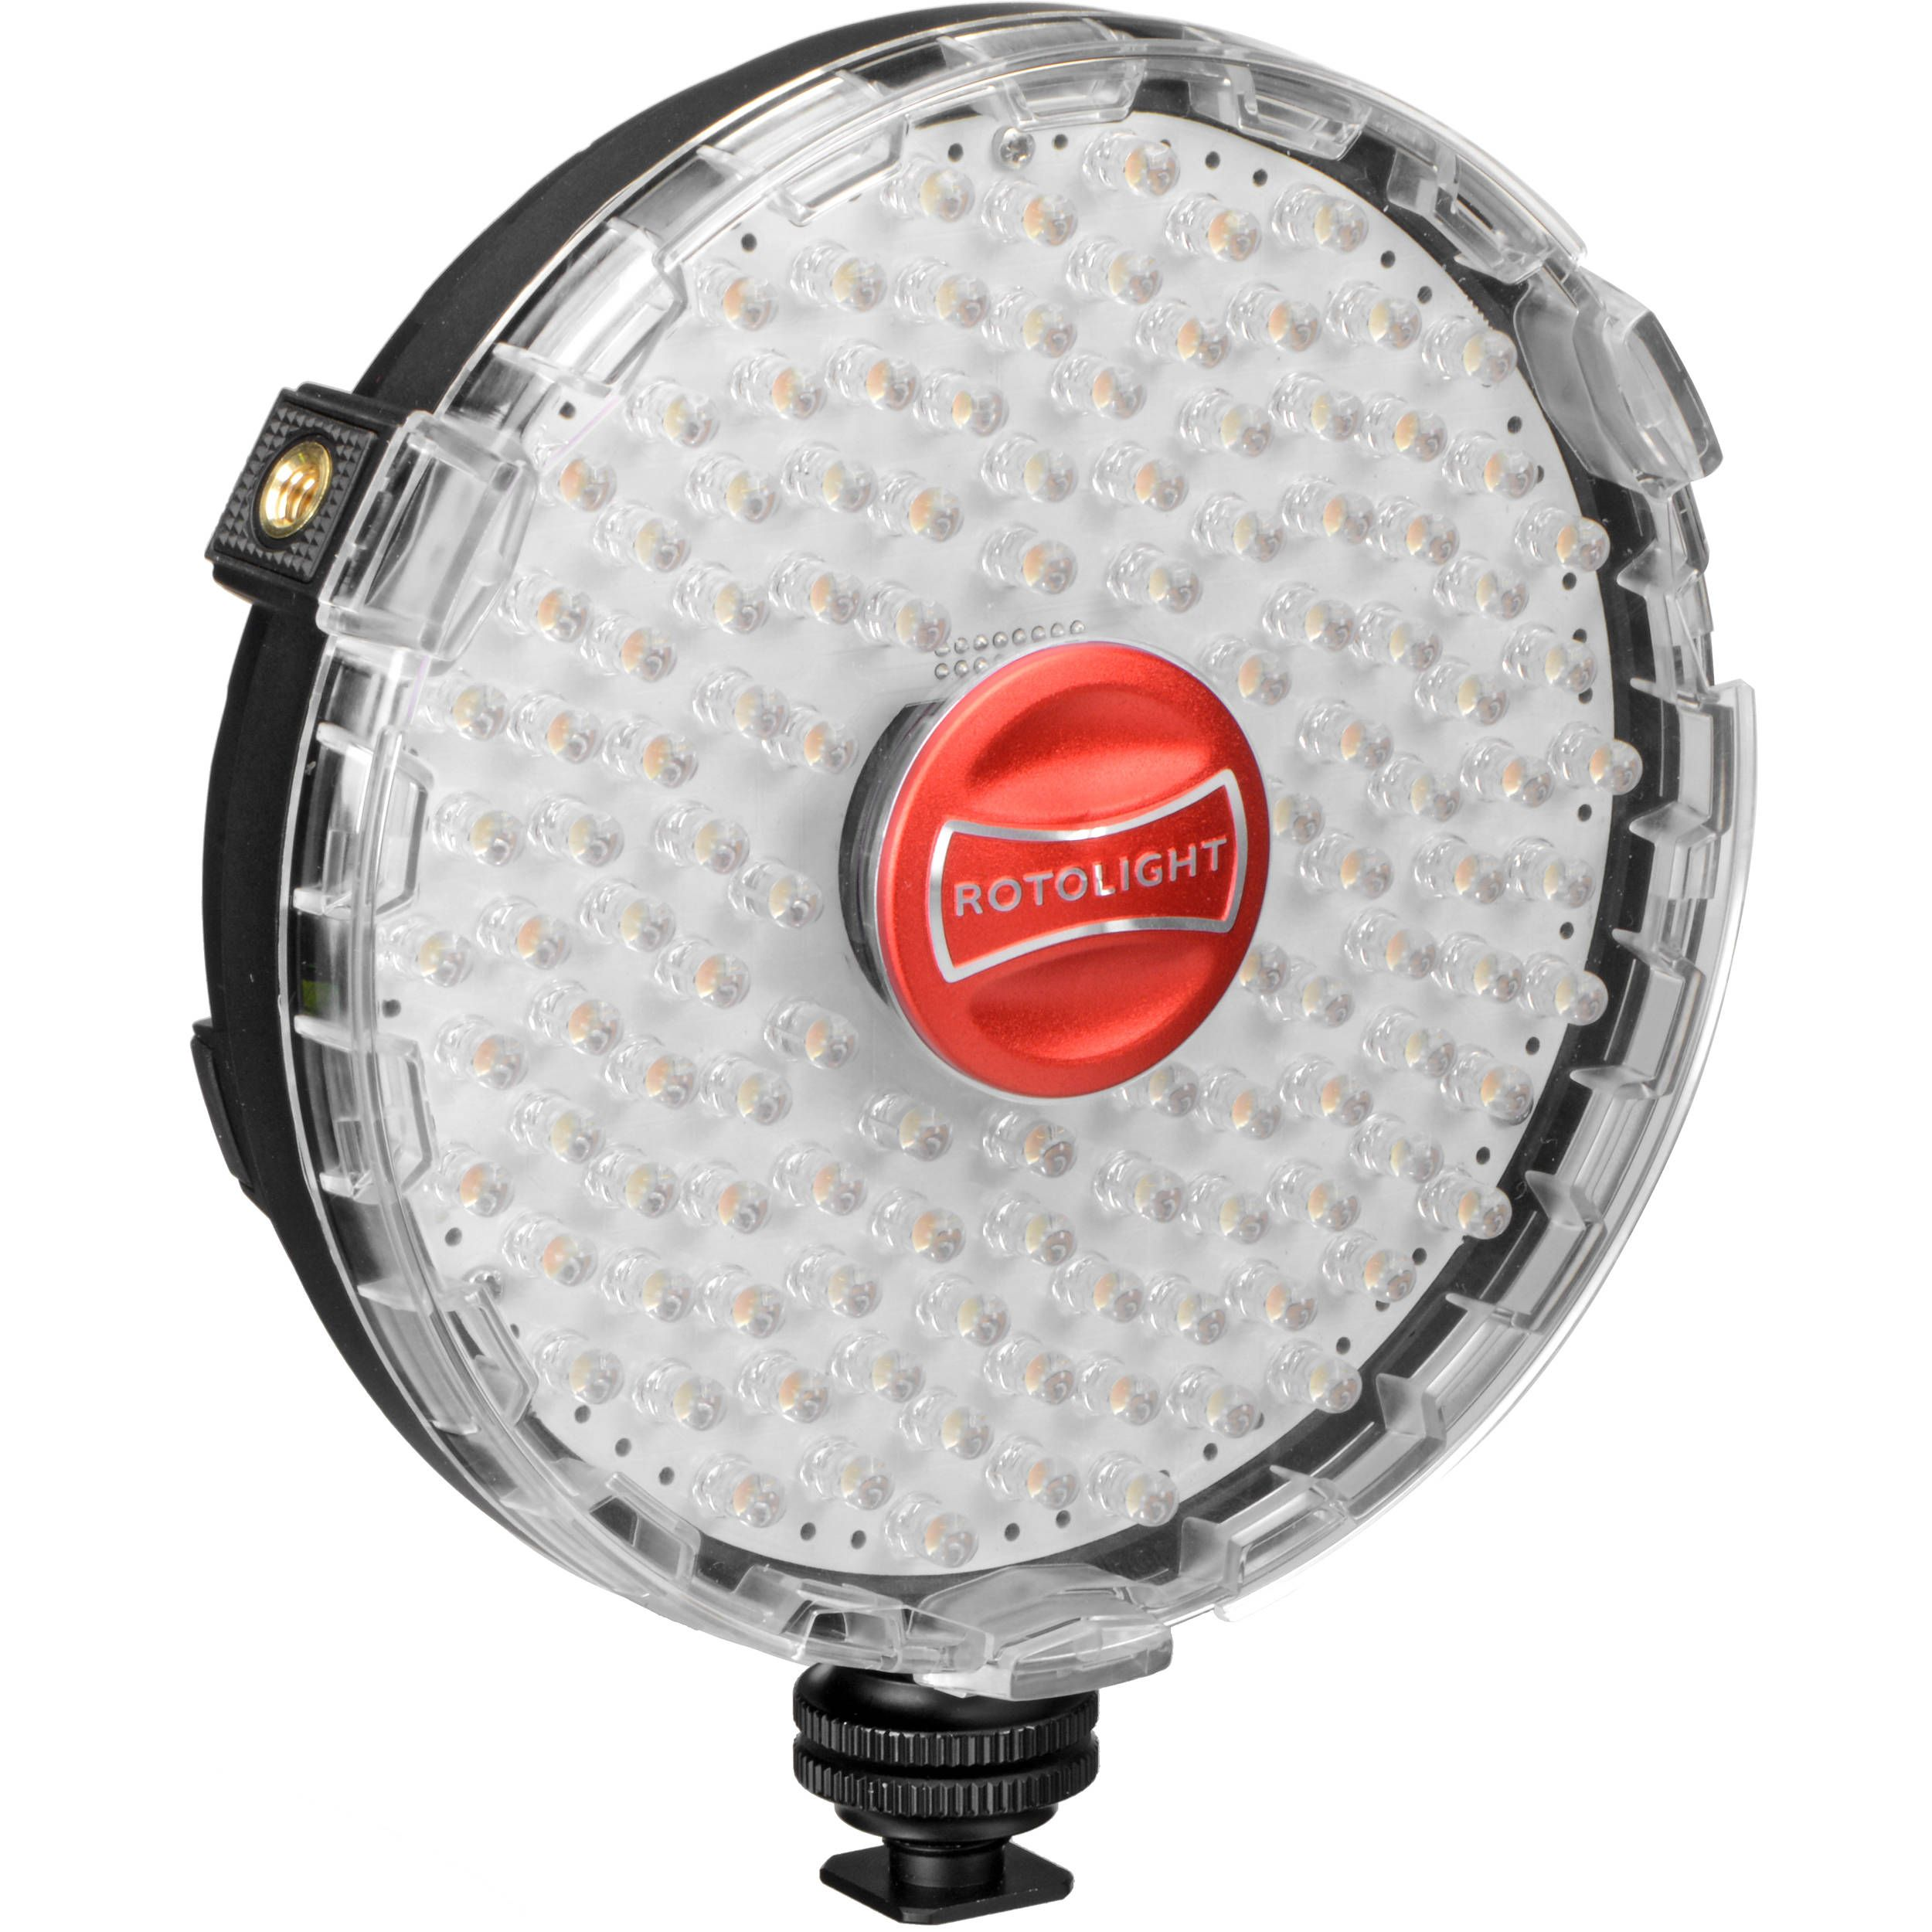 Camera Light Fixture: Rotolight Rotolight NEO On-Camera LED Light